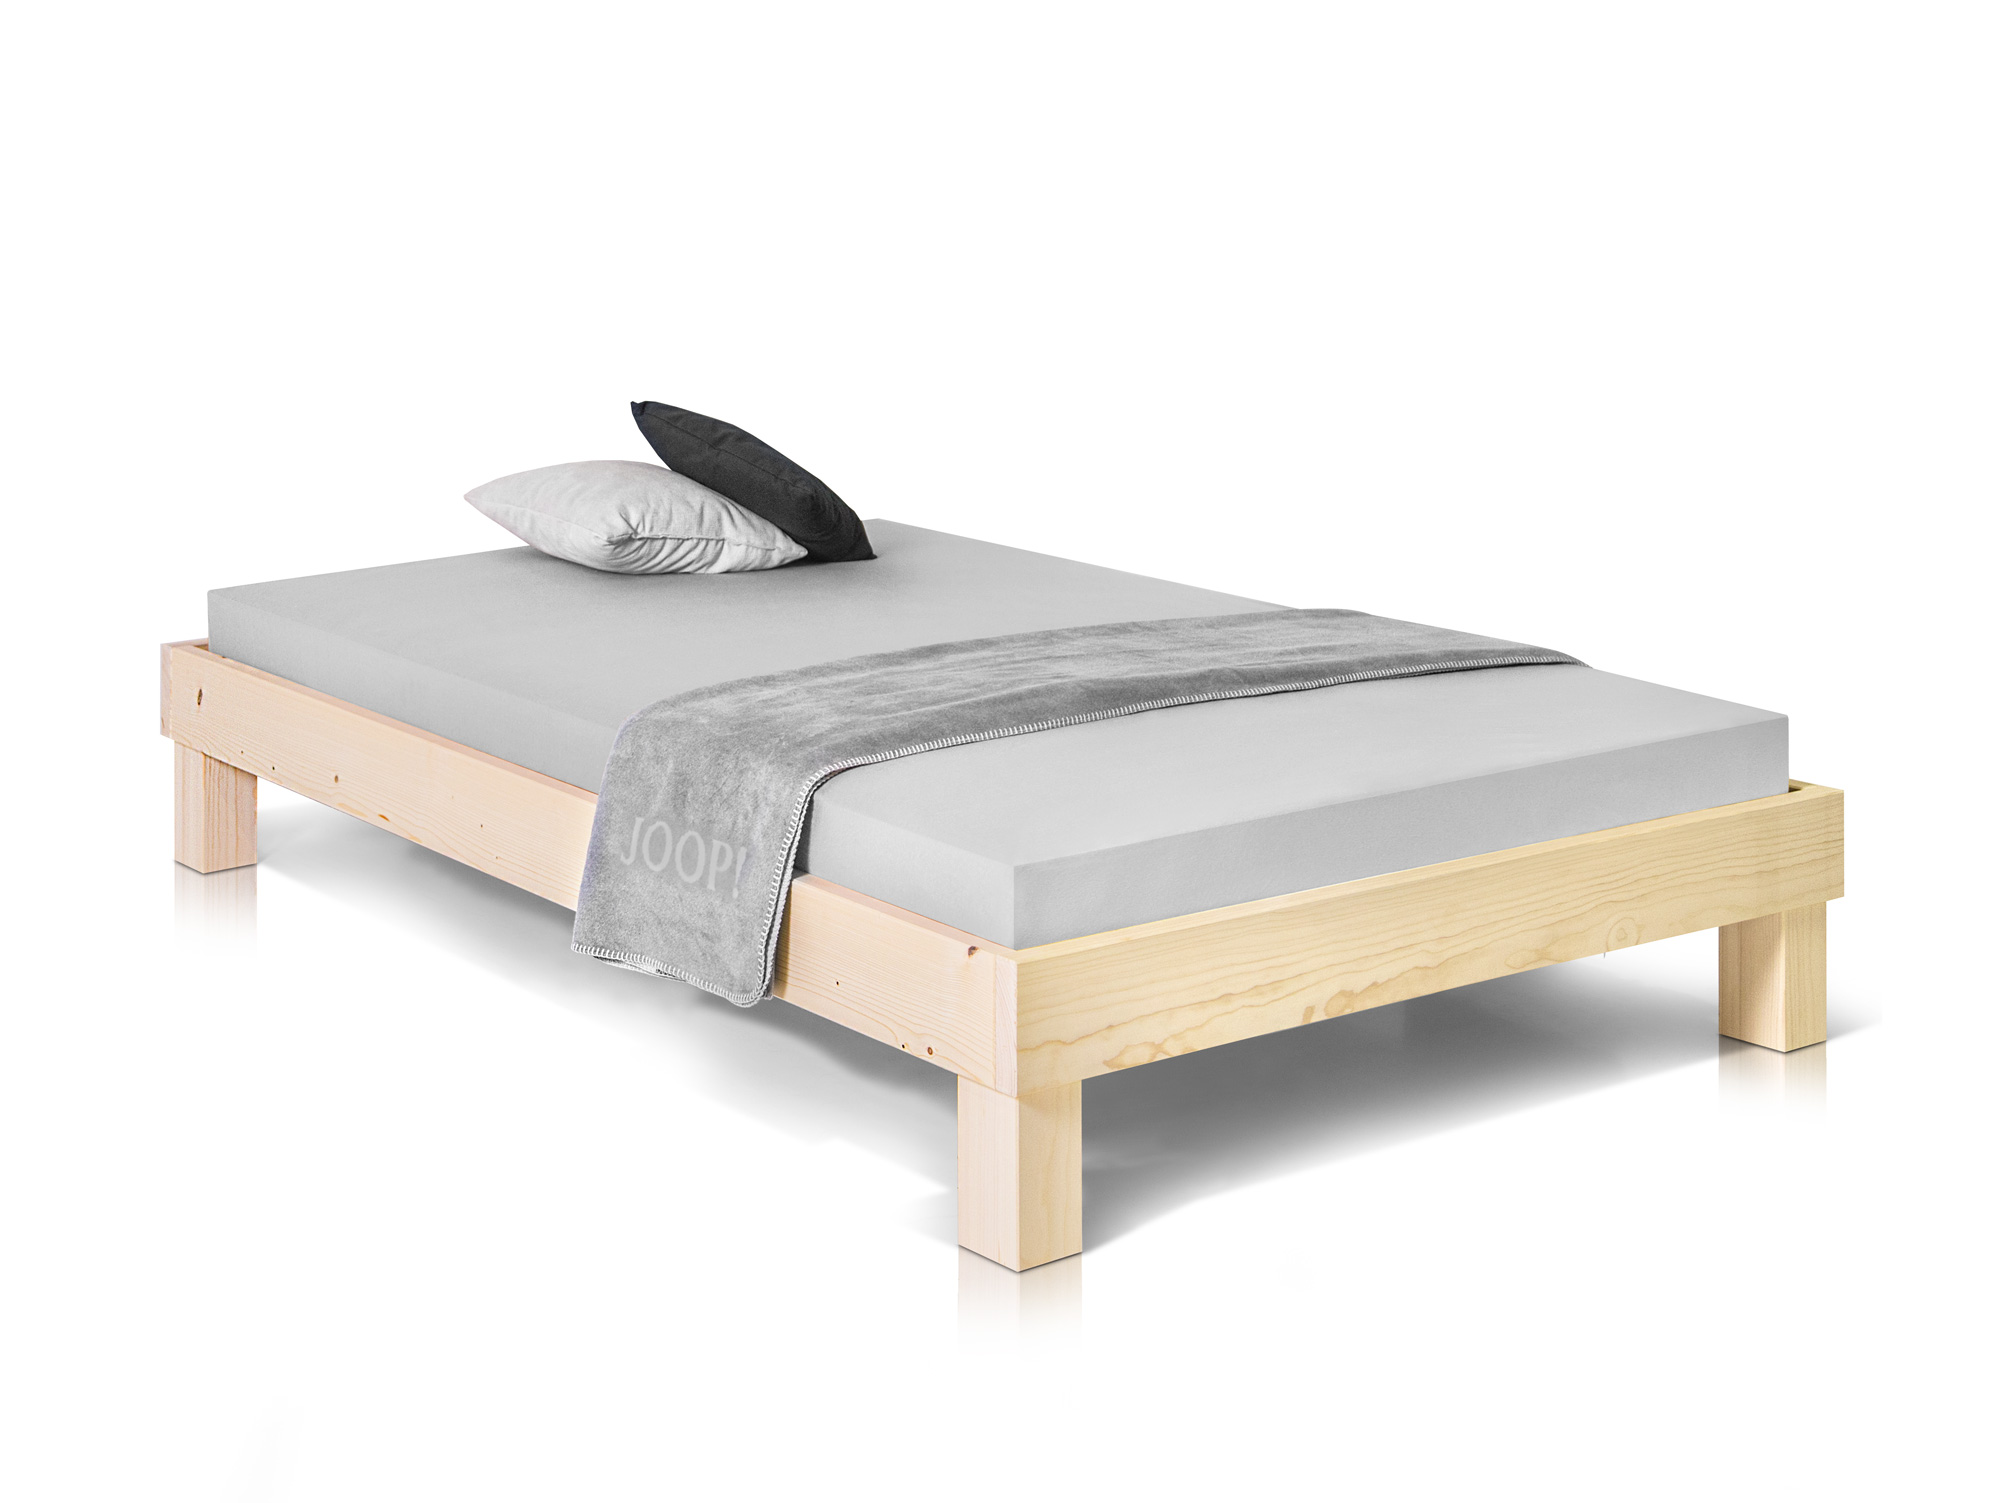 pumba singlebett futonbett bett 90x200 massivholzbett fichte natur ohne kopfteil ebay. Black Bedroom Furniture Sets. Home Design Ideas